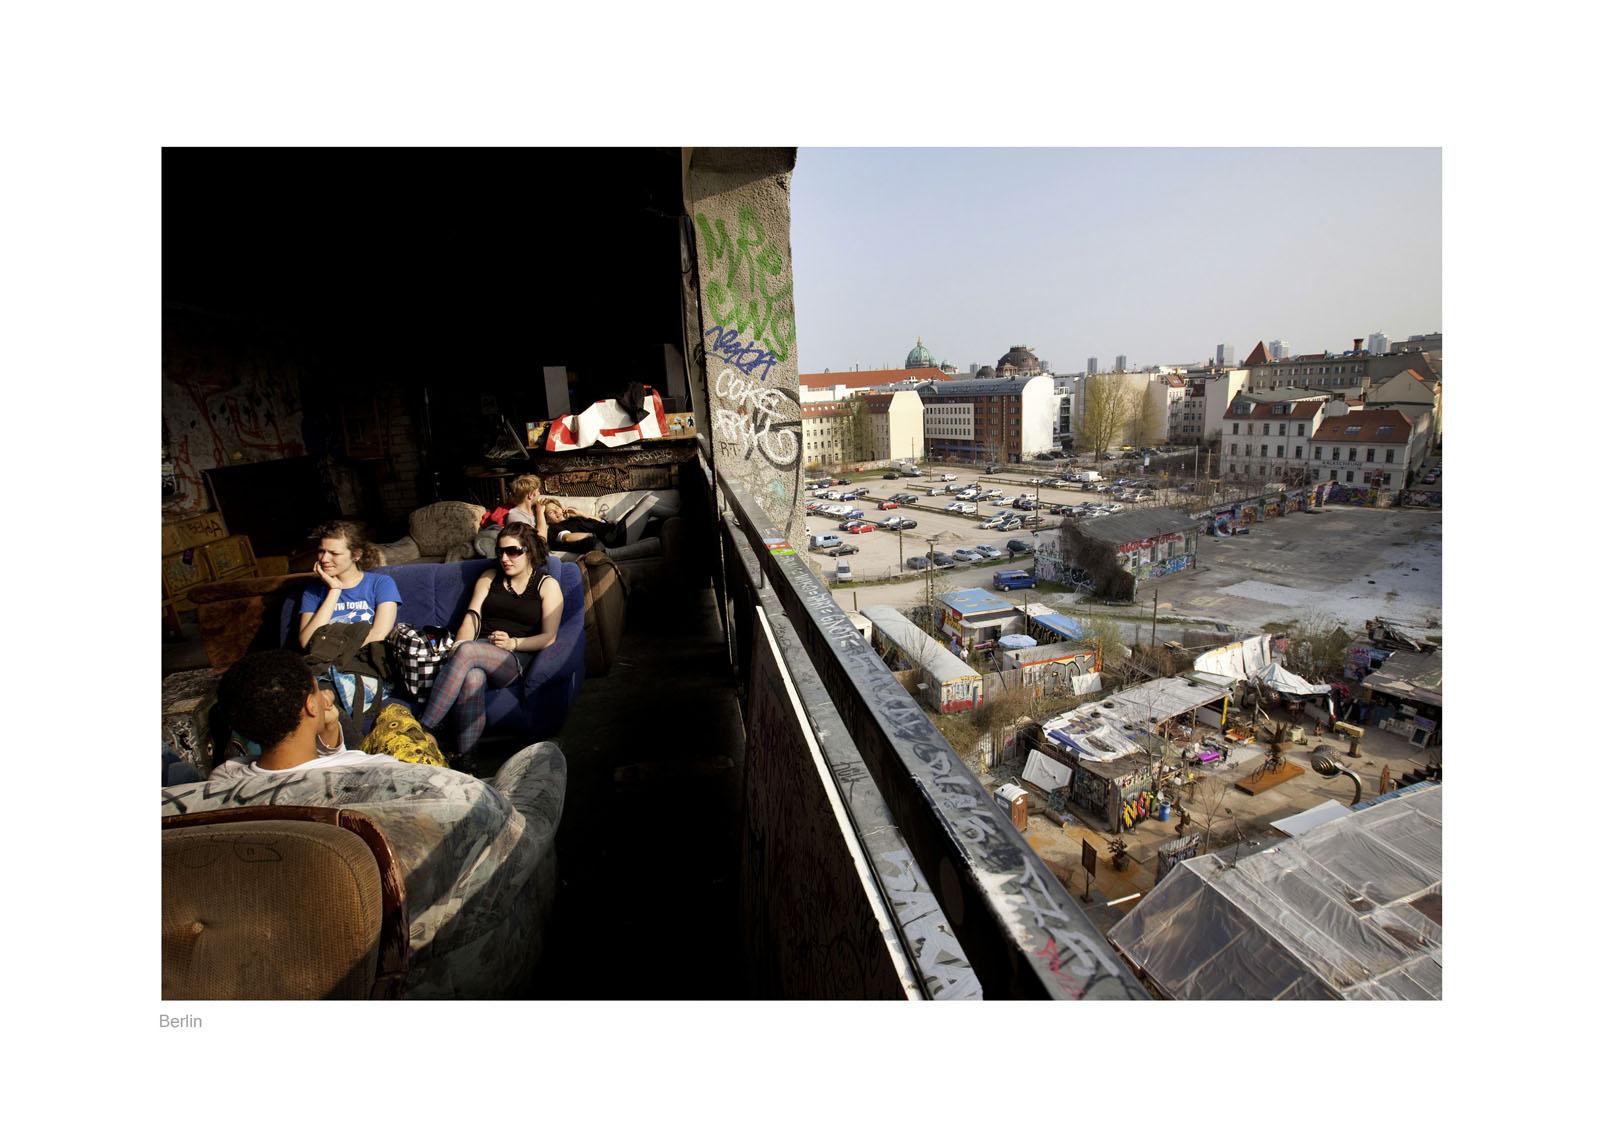 005-Norsic-urbanisme-005